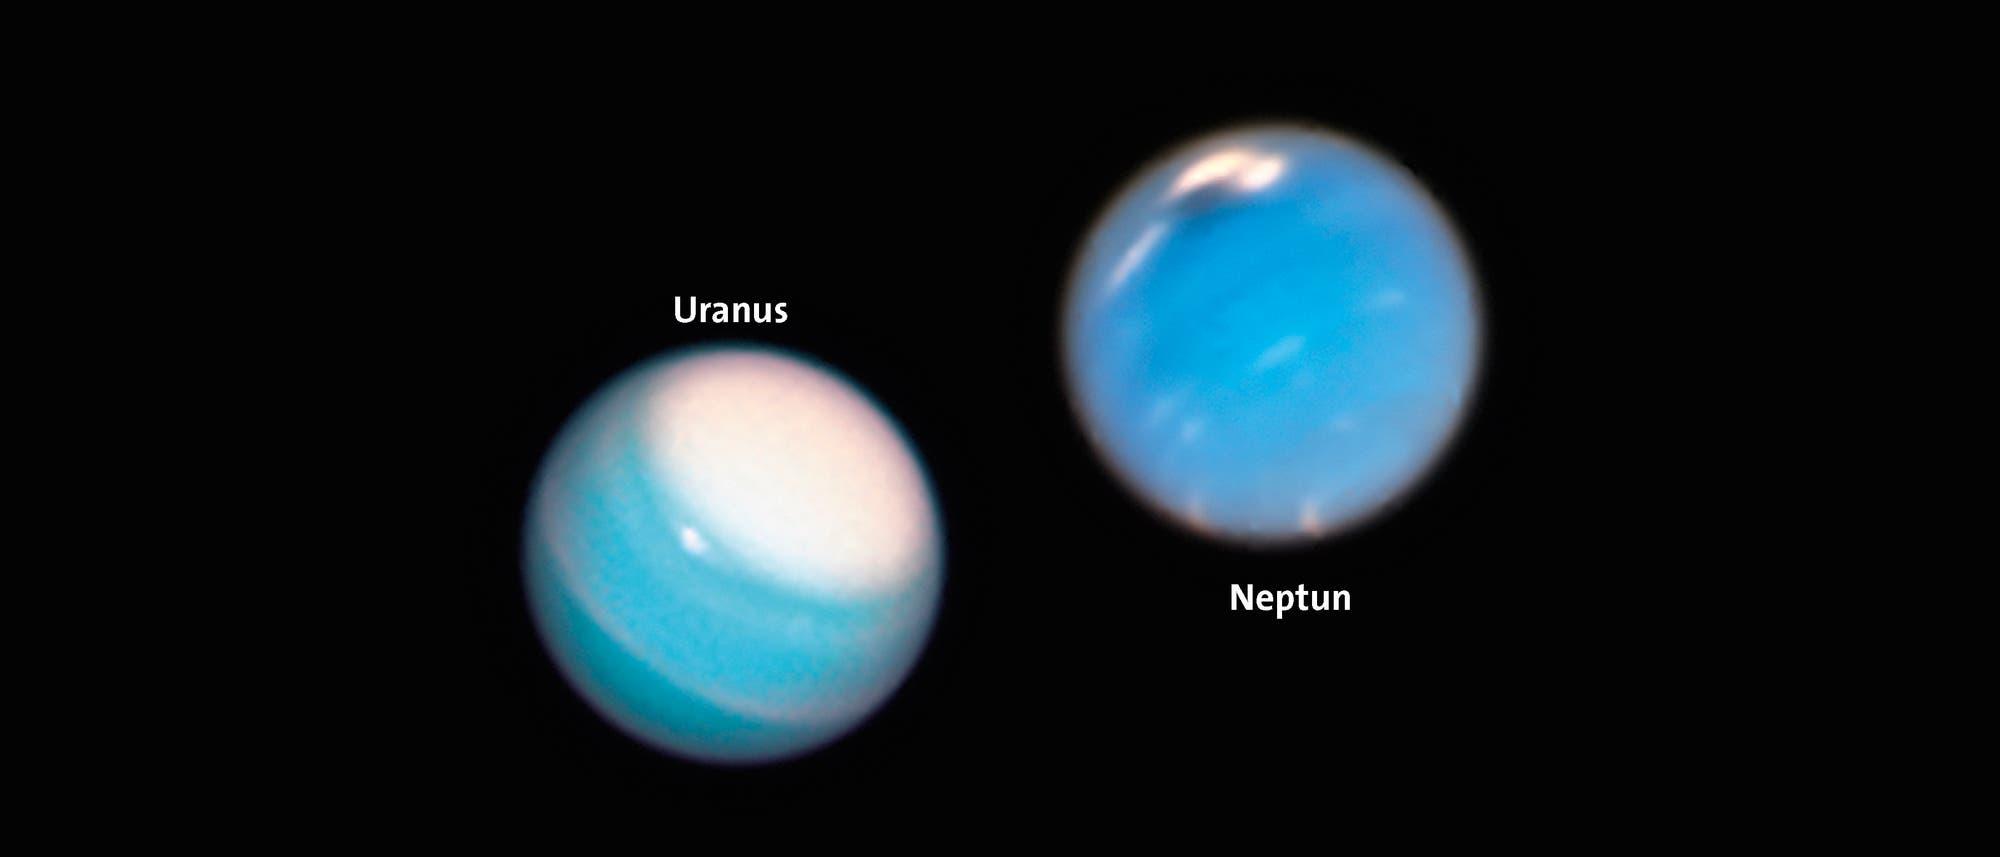 Uranus & Neptun